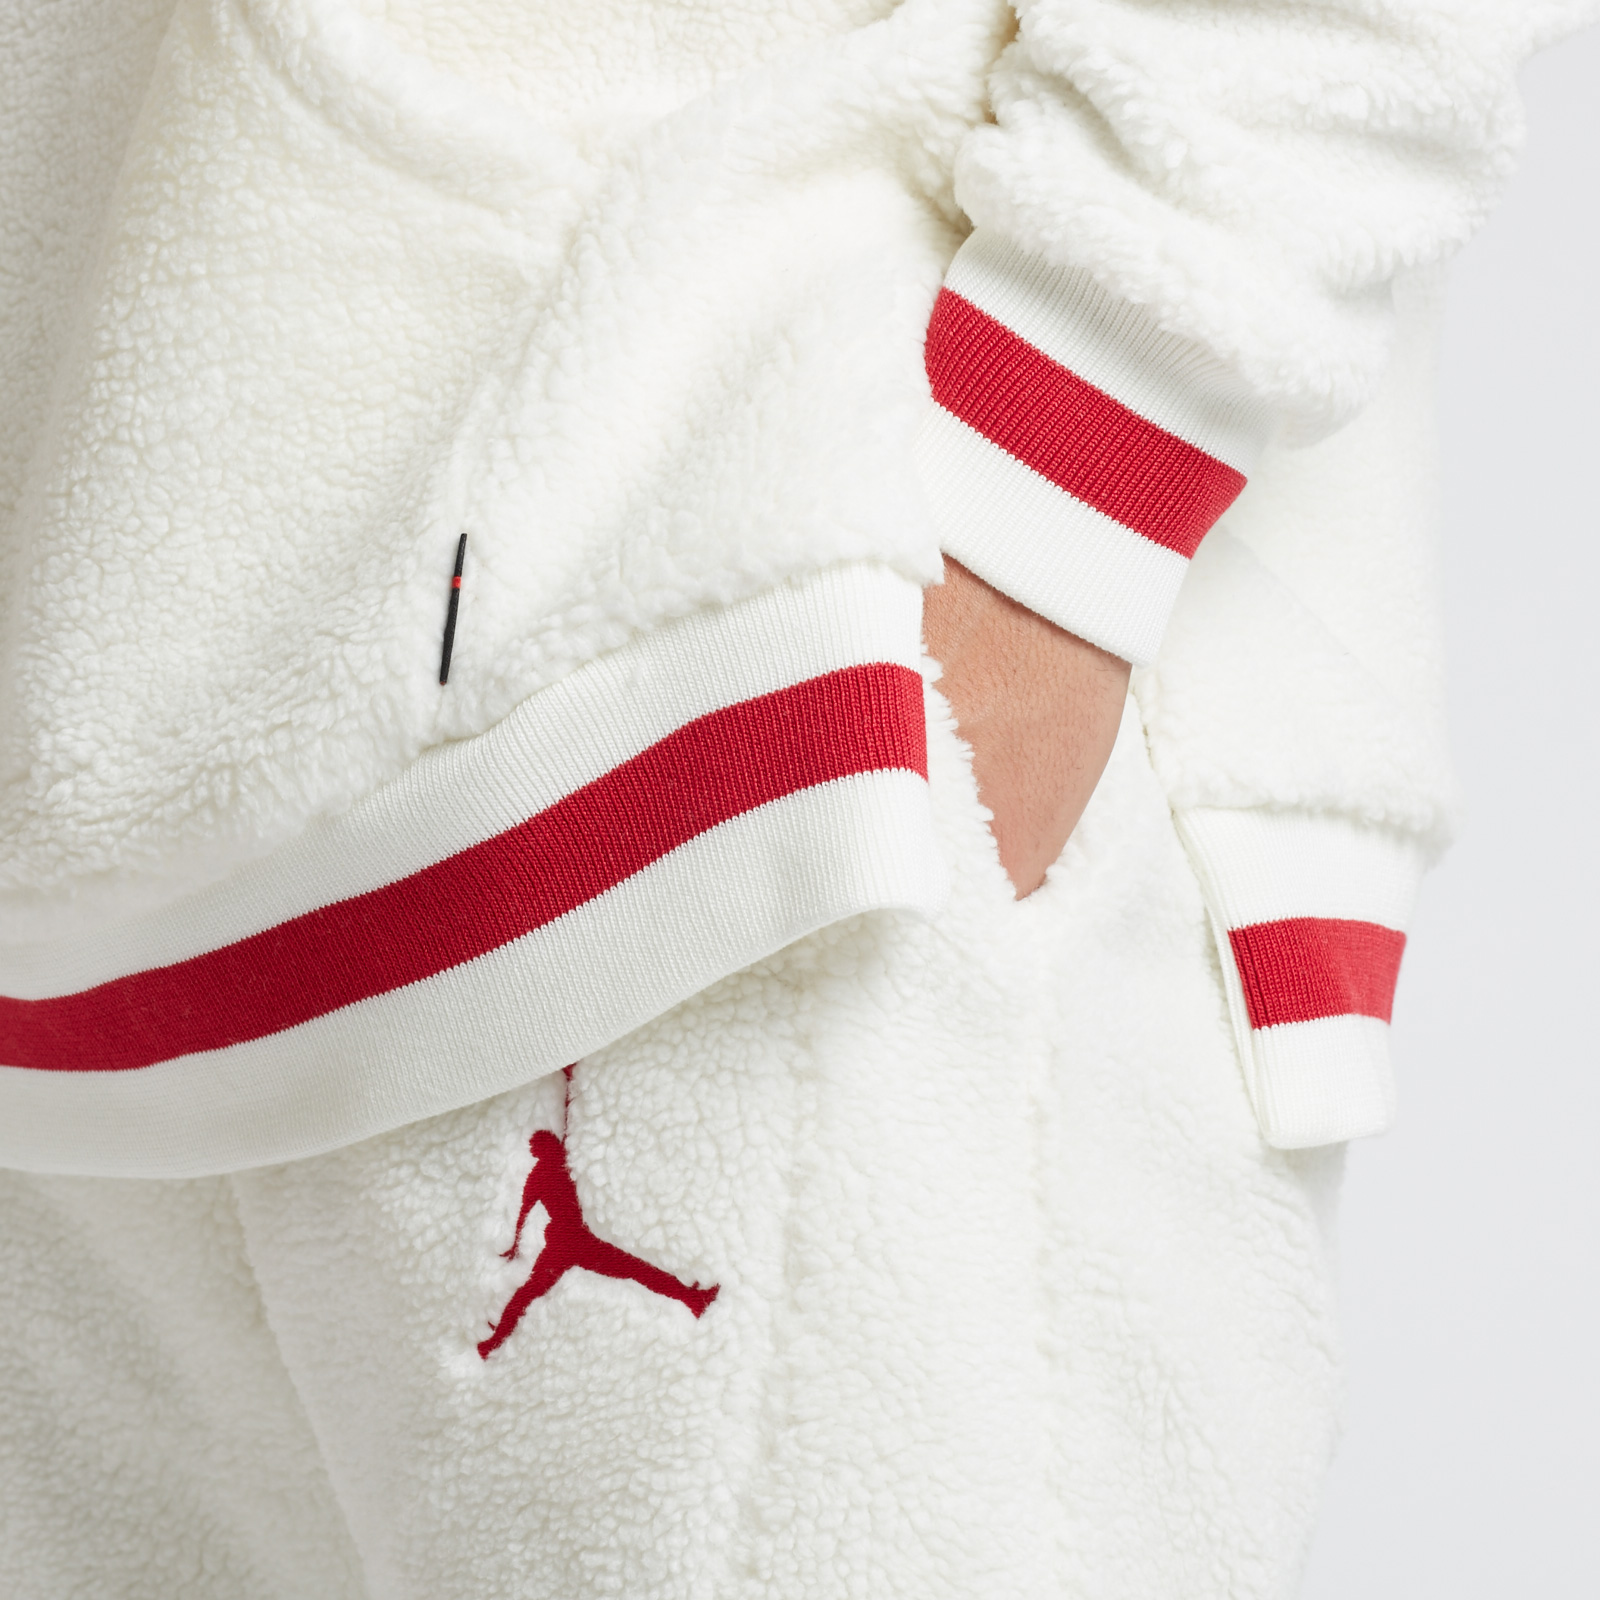 1df582469ff52c Jordan Brand Shearling AJ1 Fleece Pant - Ah7911-133 - Sneakersnstuff ...